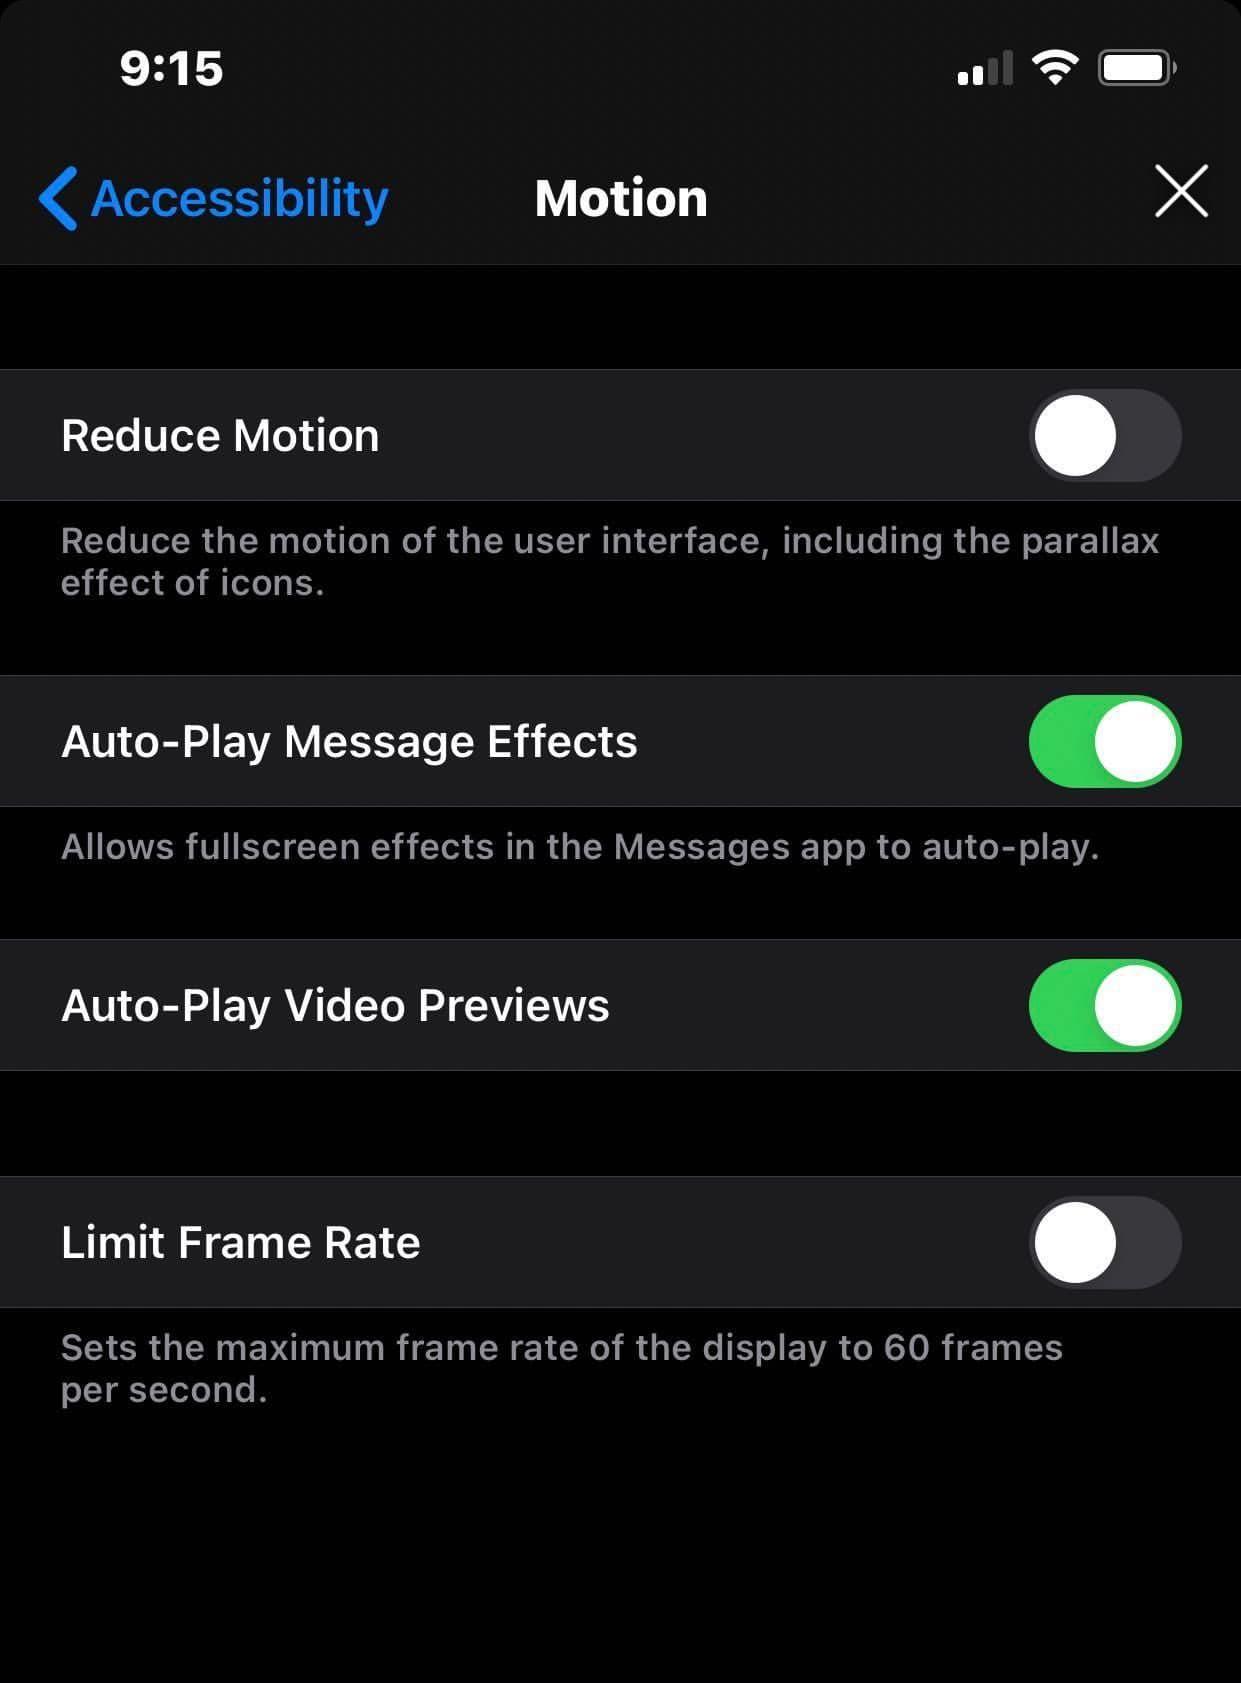 iOS 14 曝光选项和爆料证实iPhone 12 Pro屏幕会支持120Hz刷新率